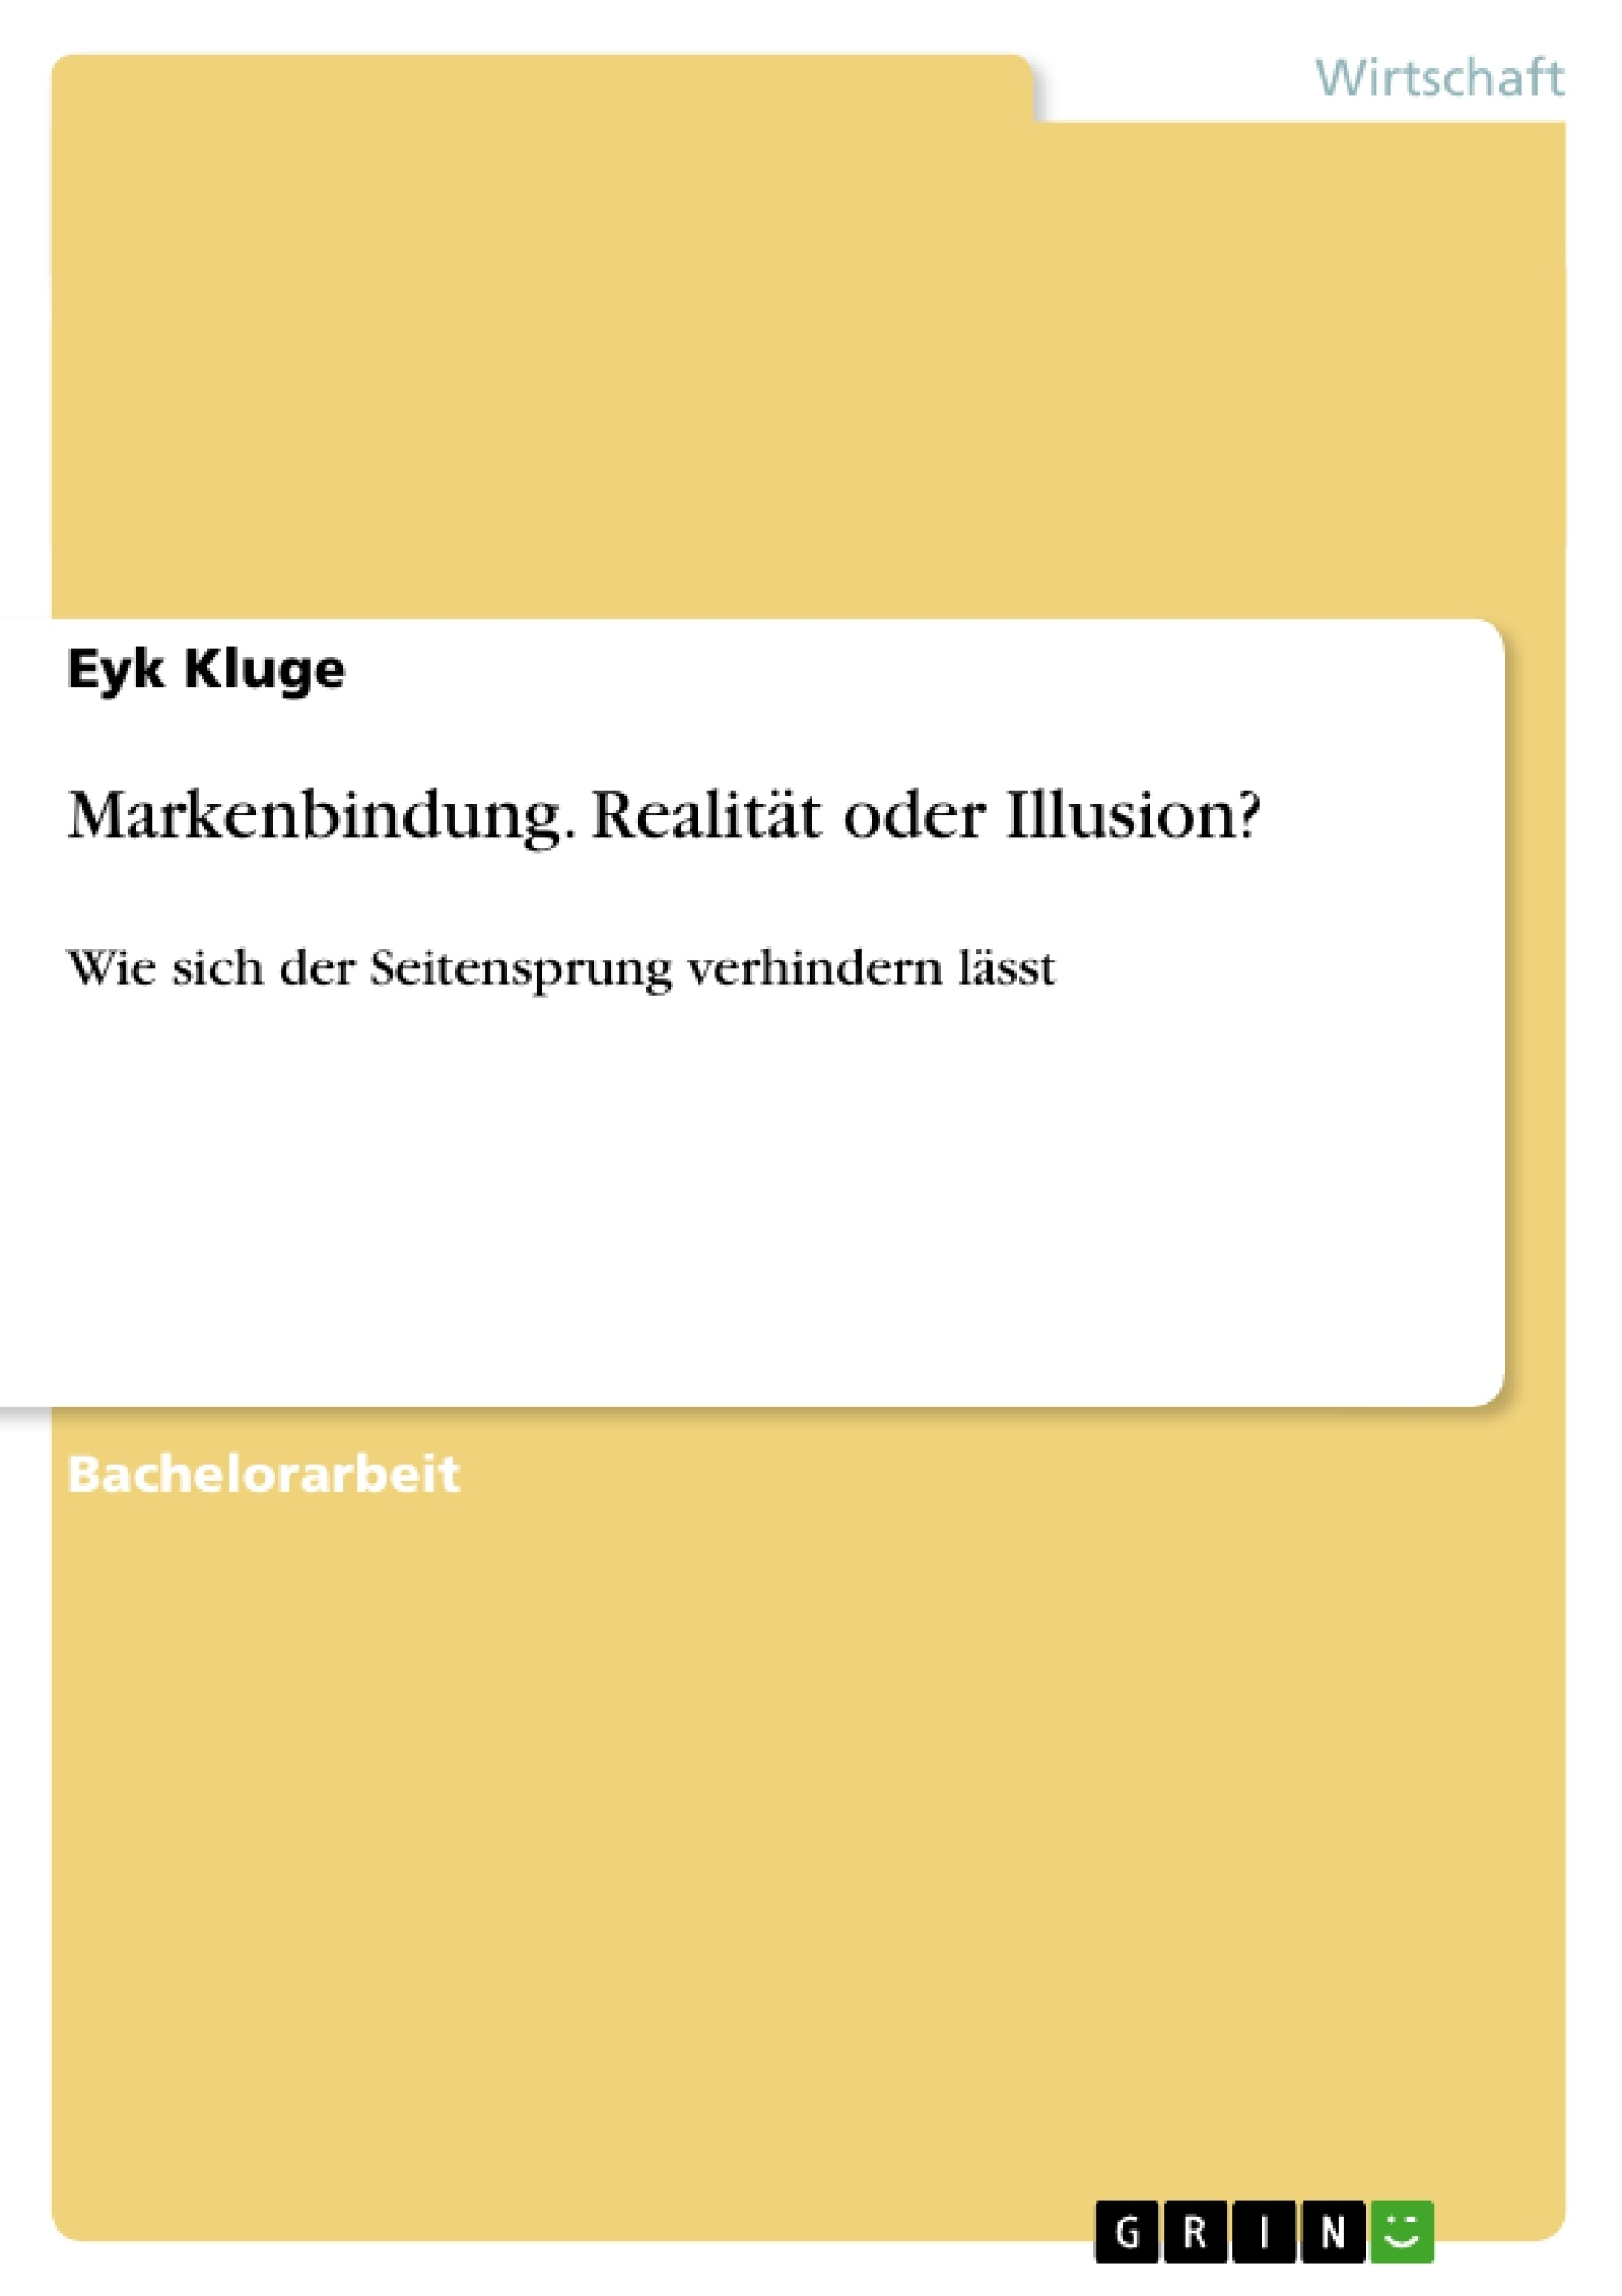 Titel: Markenbindung. Realität oder Illusion?